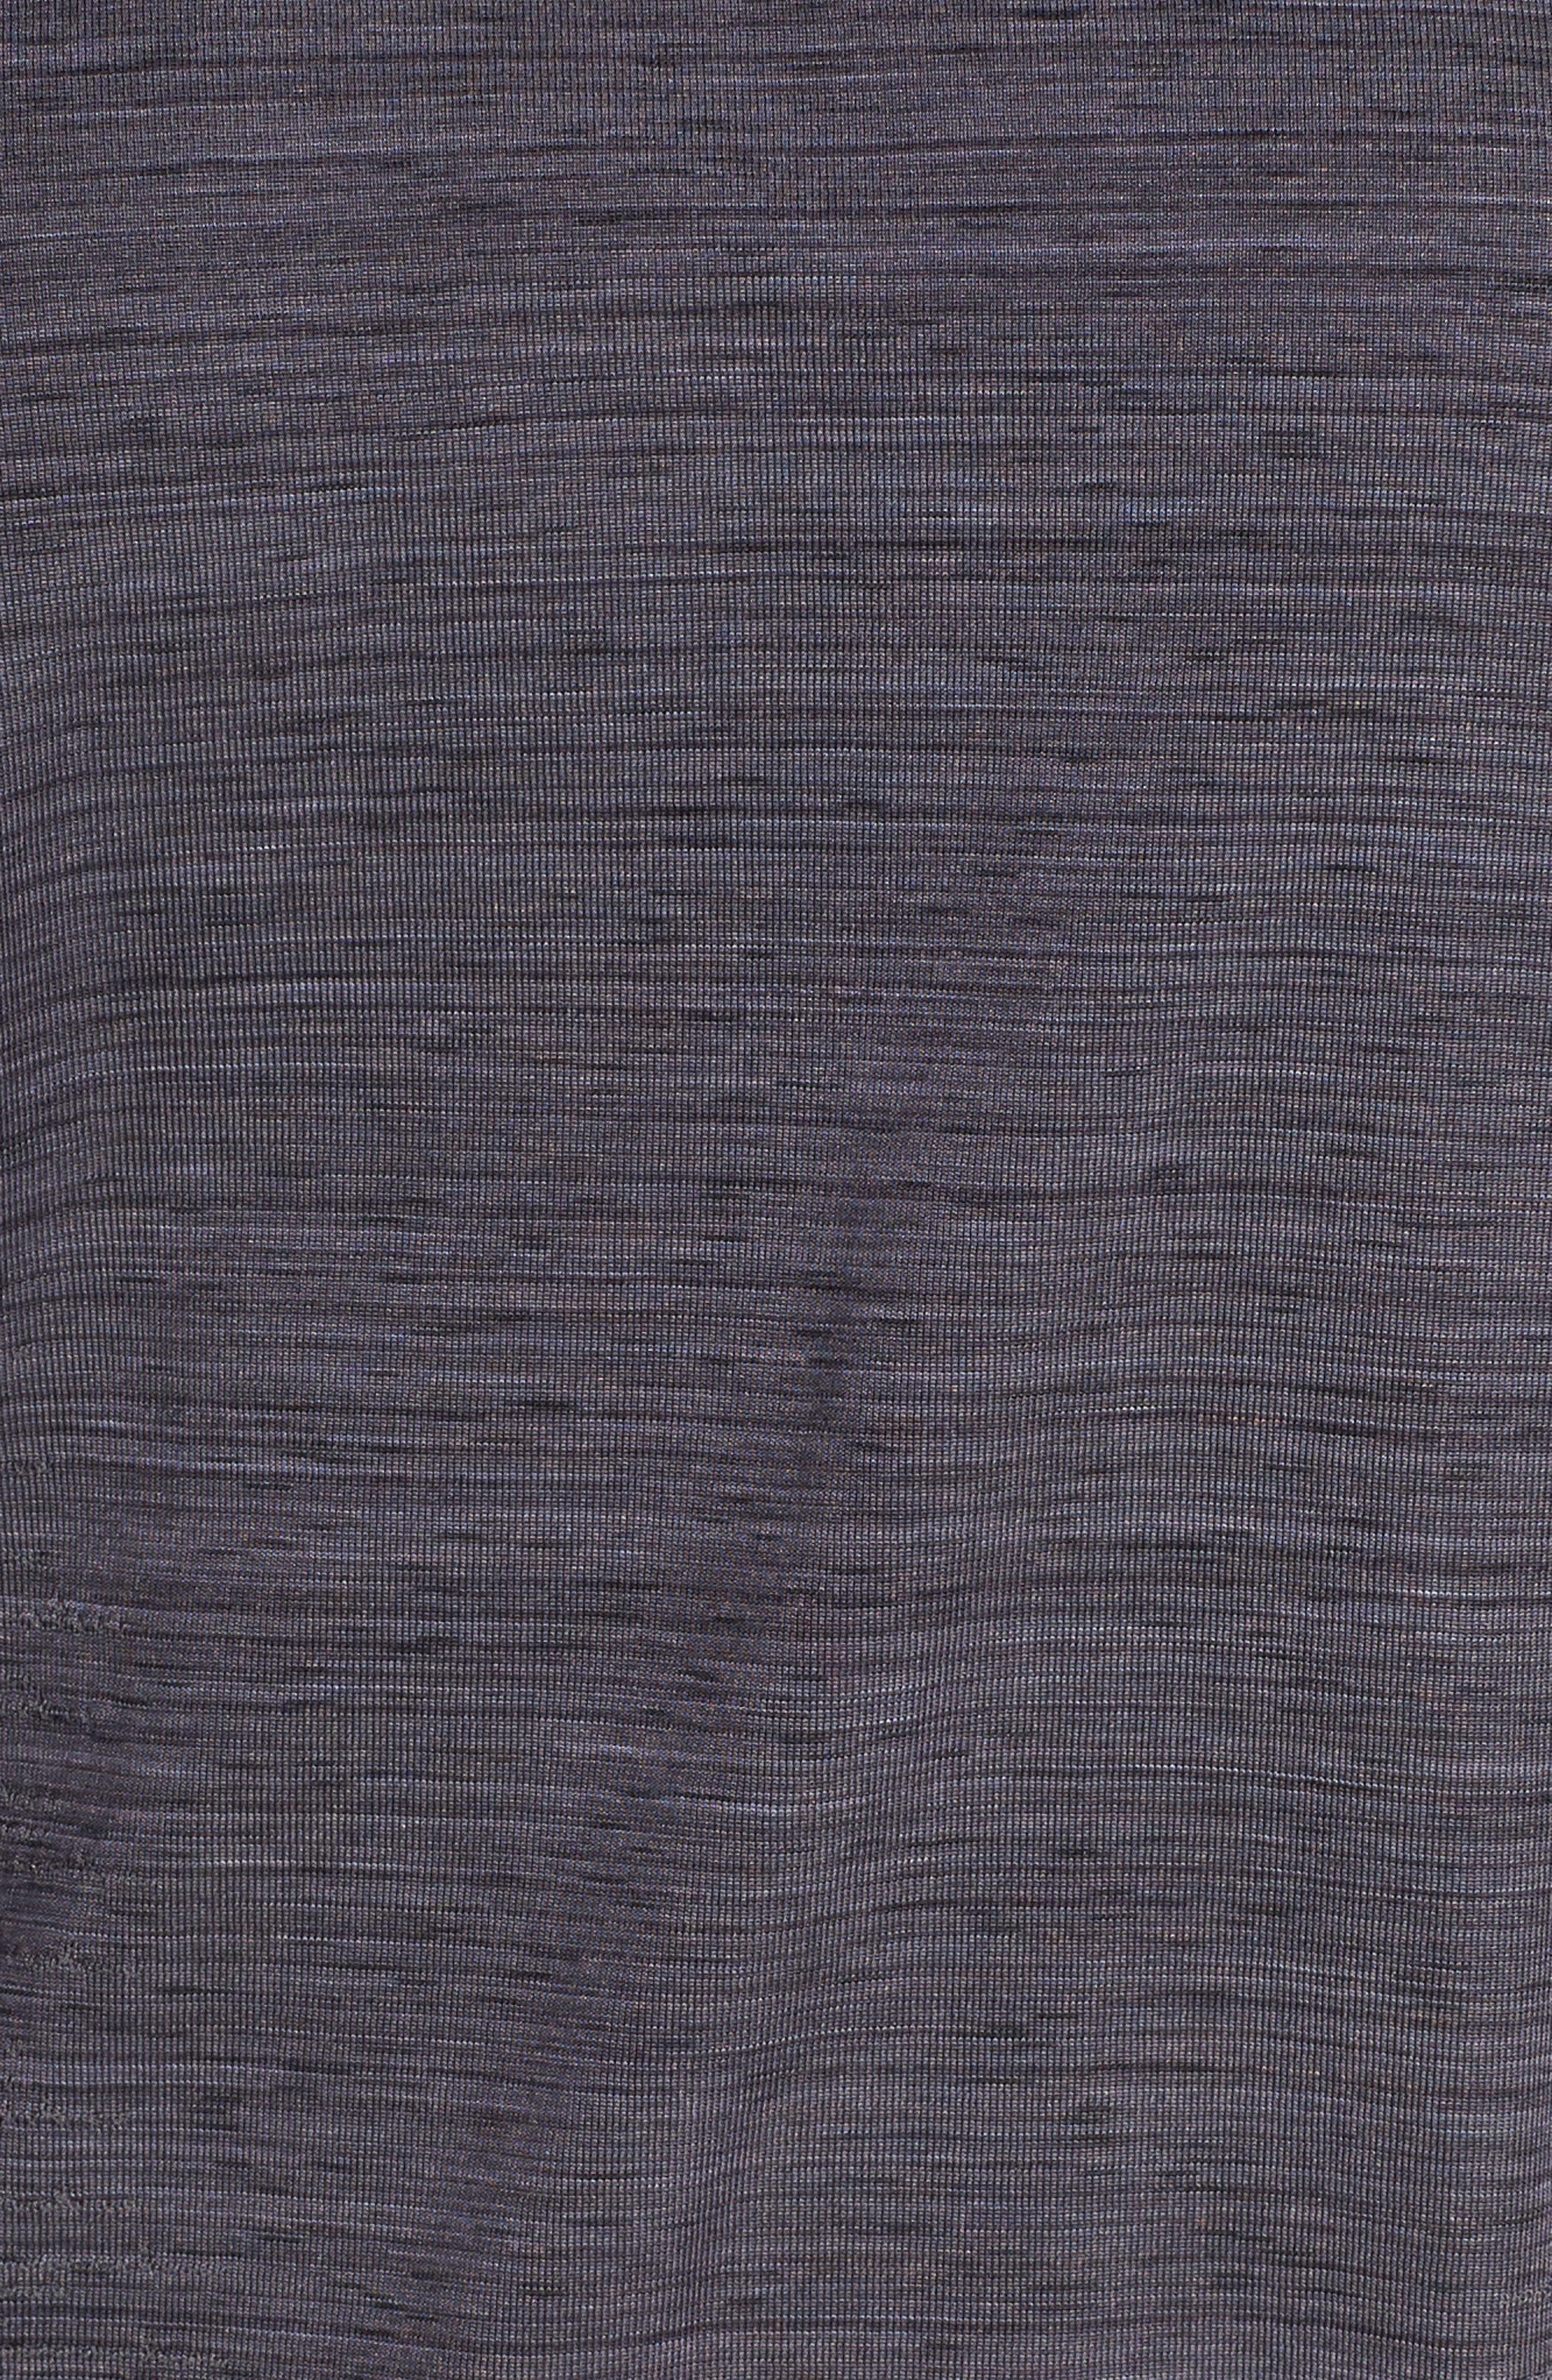 Vanish Space Dye Tee,                             Alternate thumbnail 6, color,                             BLACK/ CHARCOAL/ SILVER